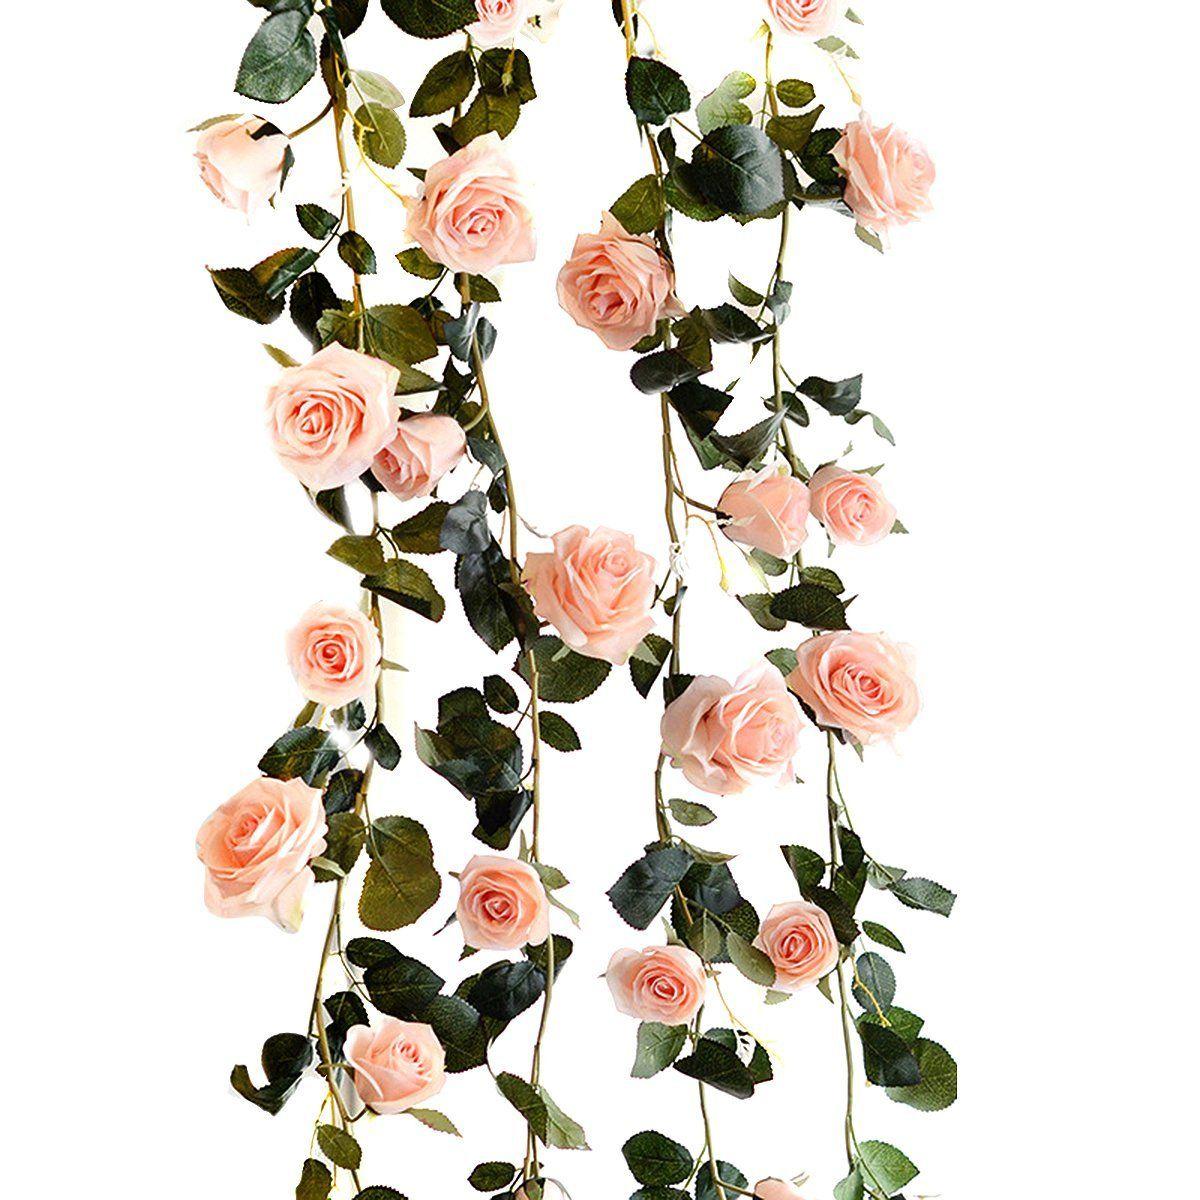 Rose Fake Leaf Home Silk Flowers Christmas Decoration Garden Party Wedding